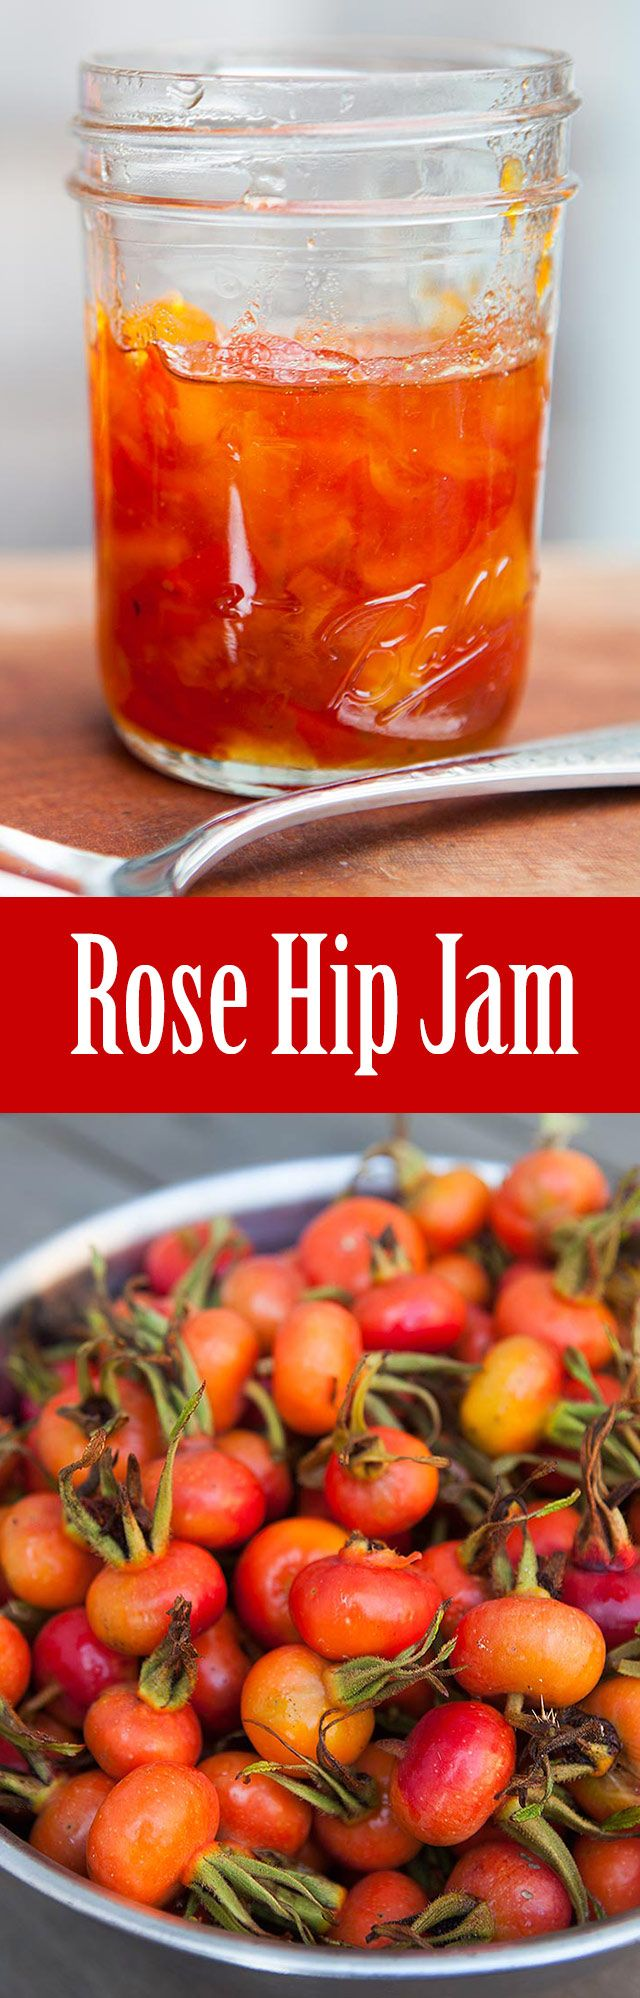 Rose Hip Jam ~ Marmalade-style rose hip jam with rose hips, orange, apple, lemon, and sugar. ~ SimplyRecipes.com